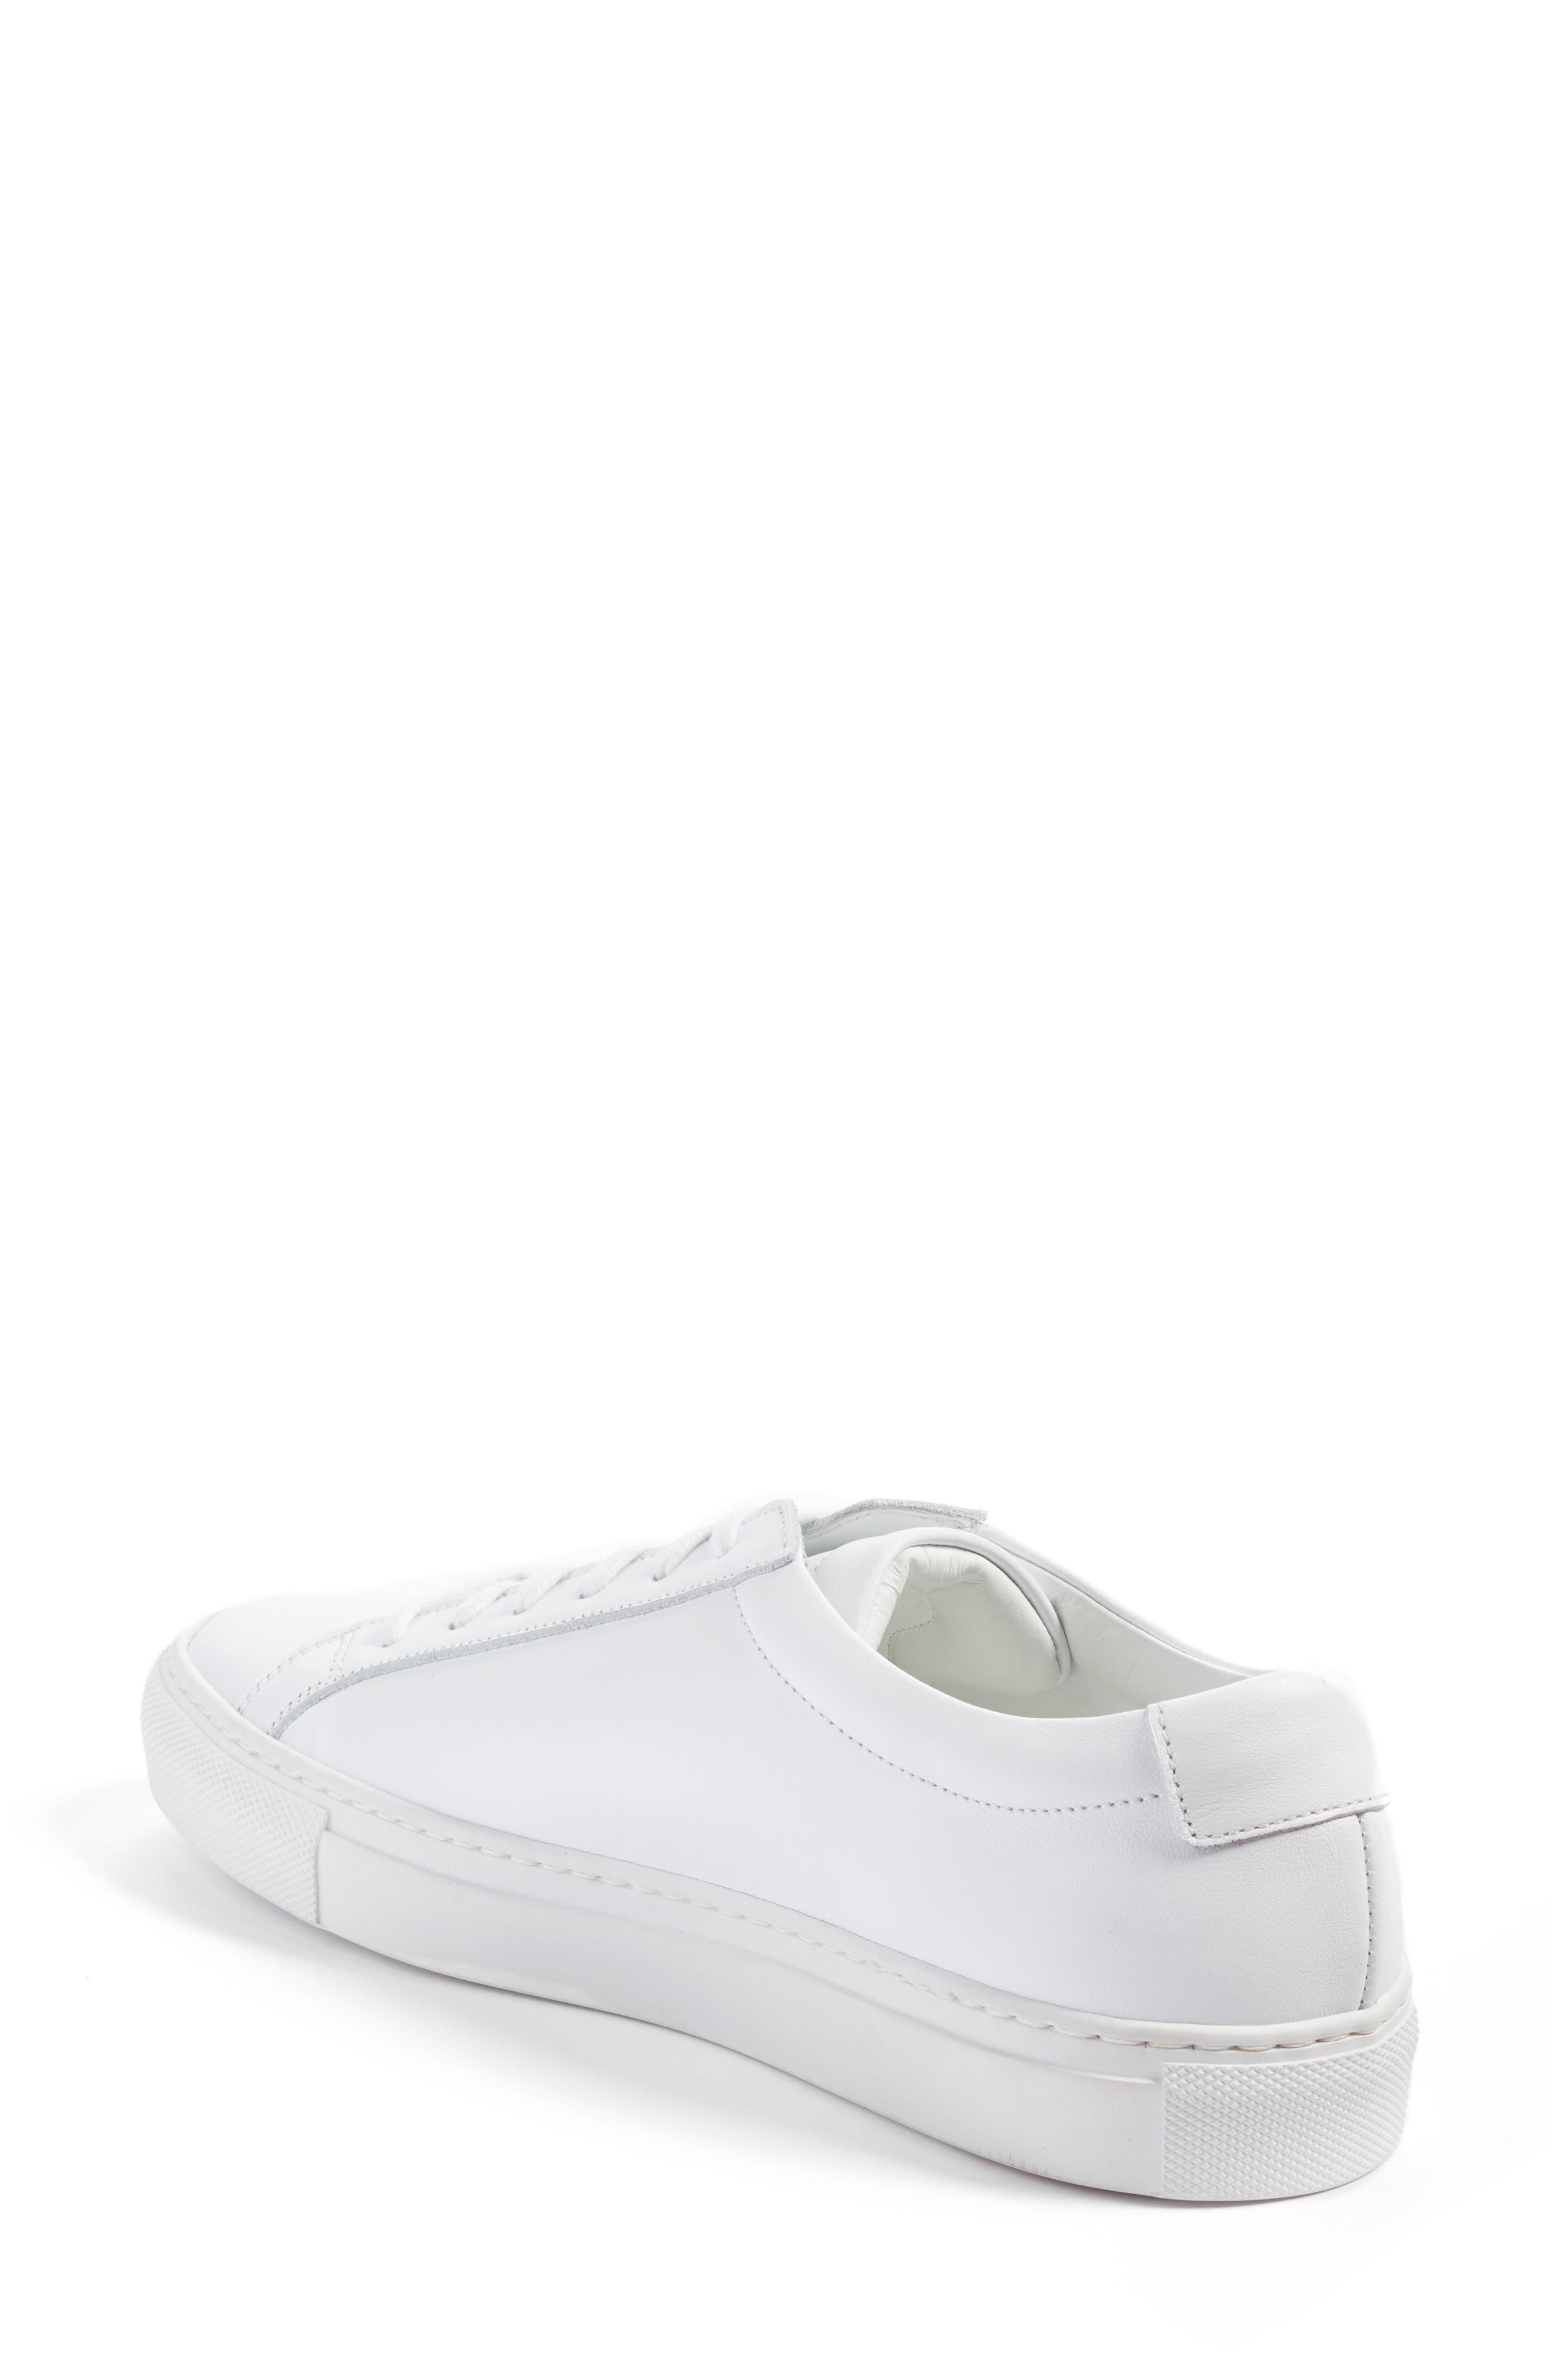 COMMON PROJECTS, Original Achilles Sneaker, Alternate thumbnail 2, color, WHITE LEATHER